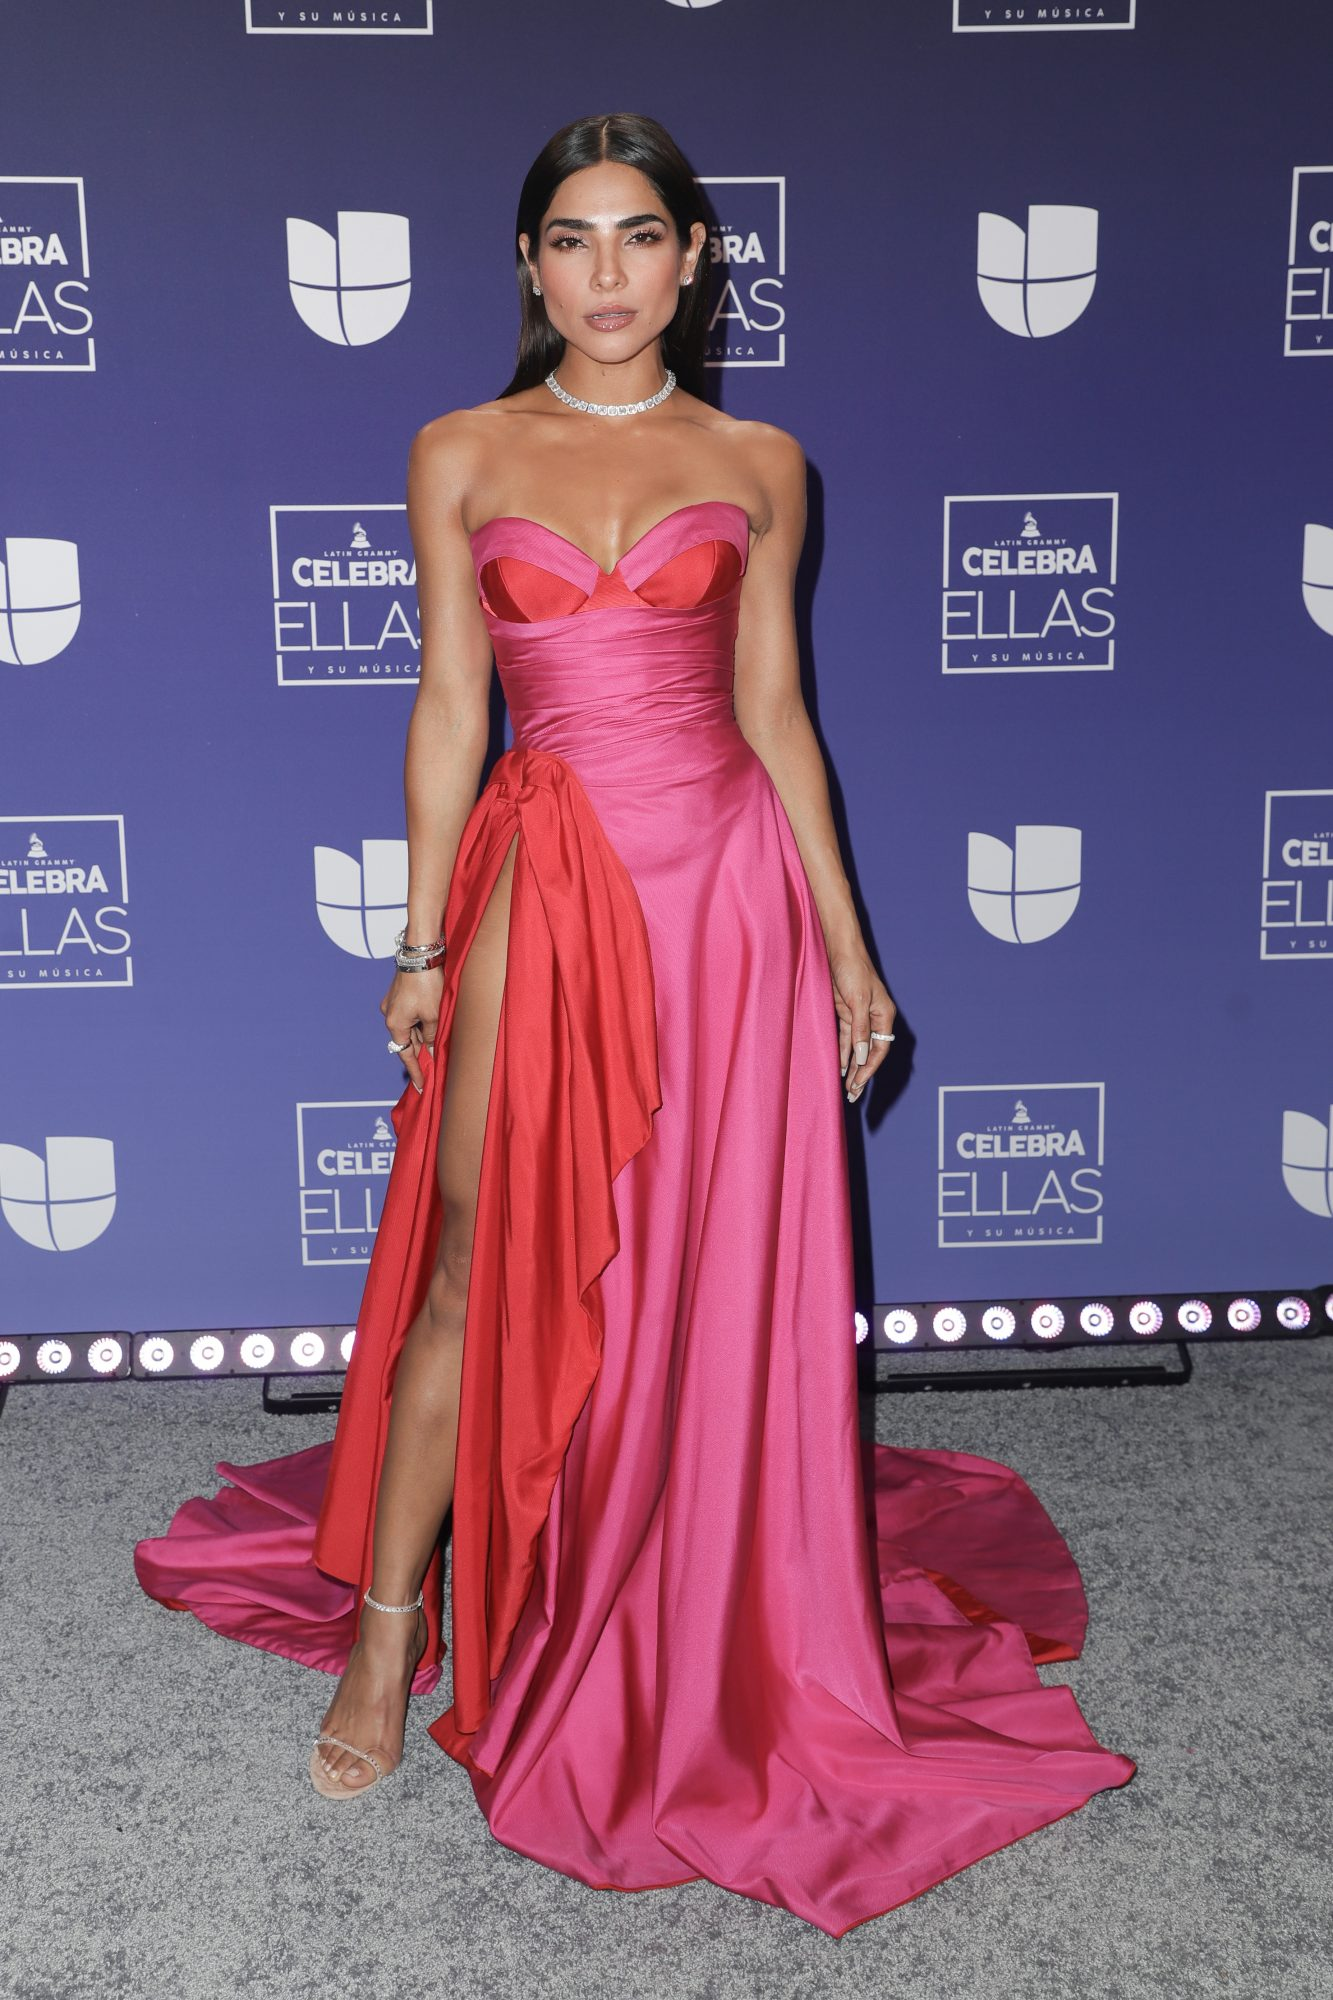 Alejandra Espinoza attends the Latin GRAMMY Celebra Ellas y Su Musica Show